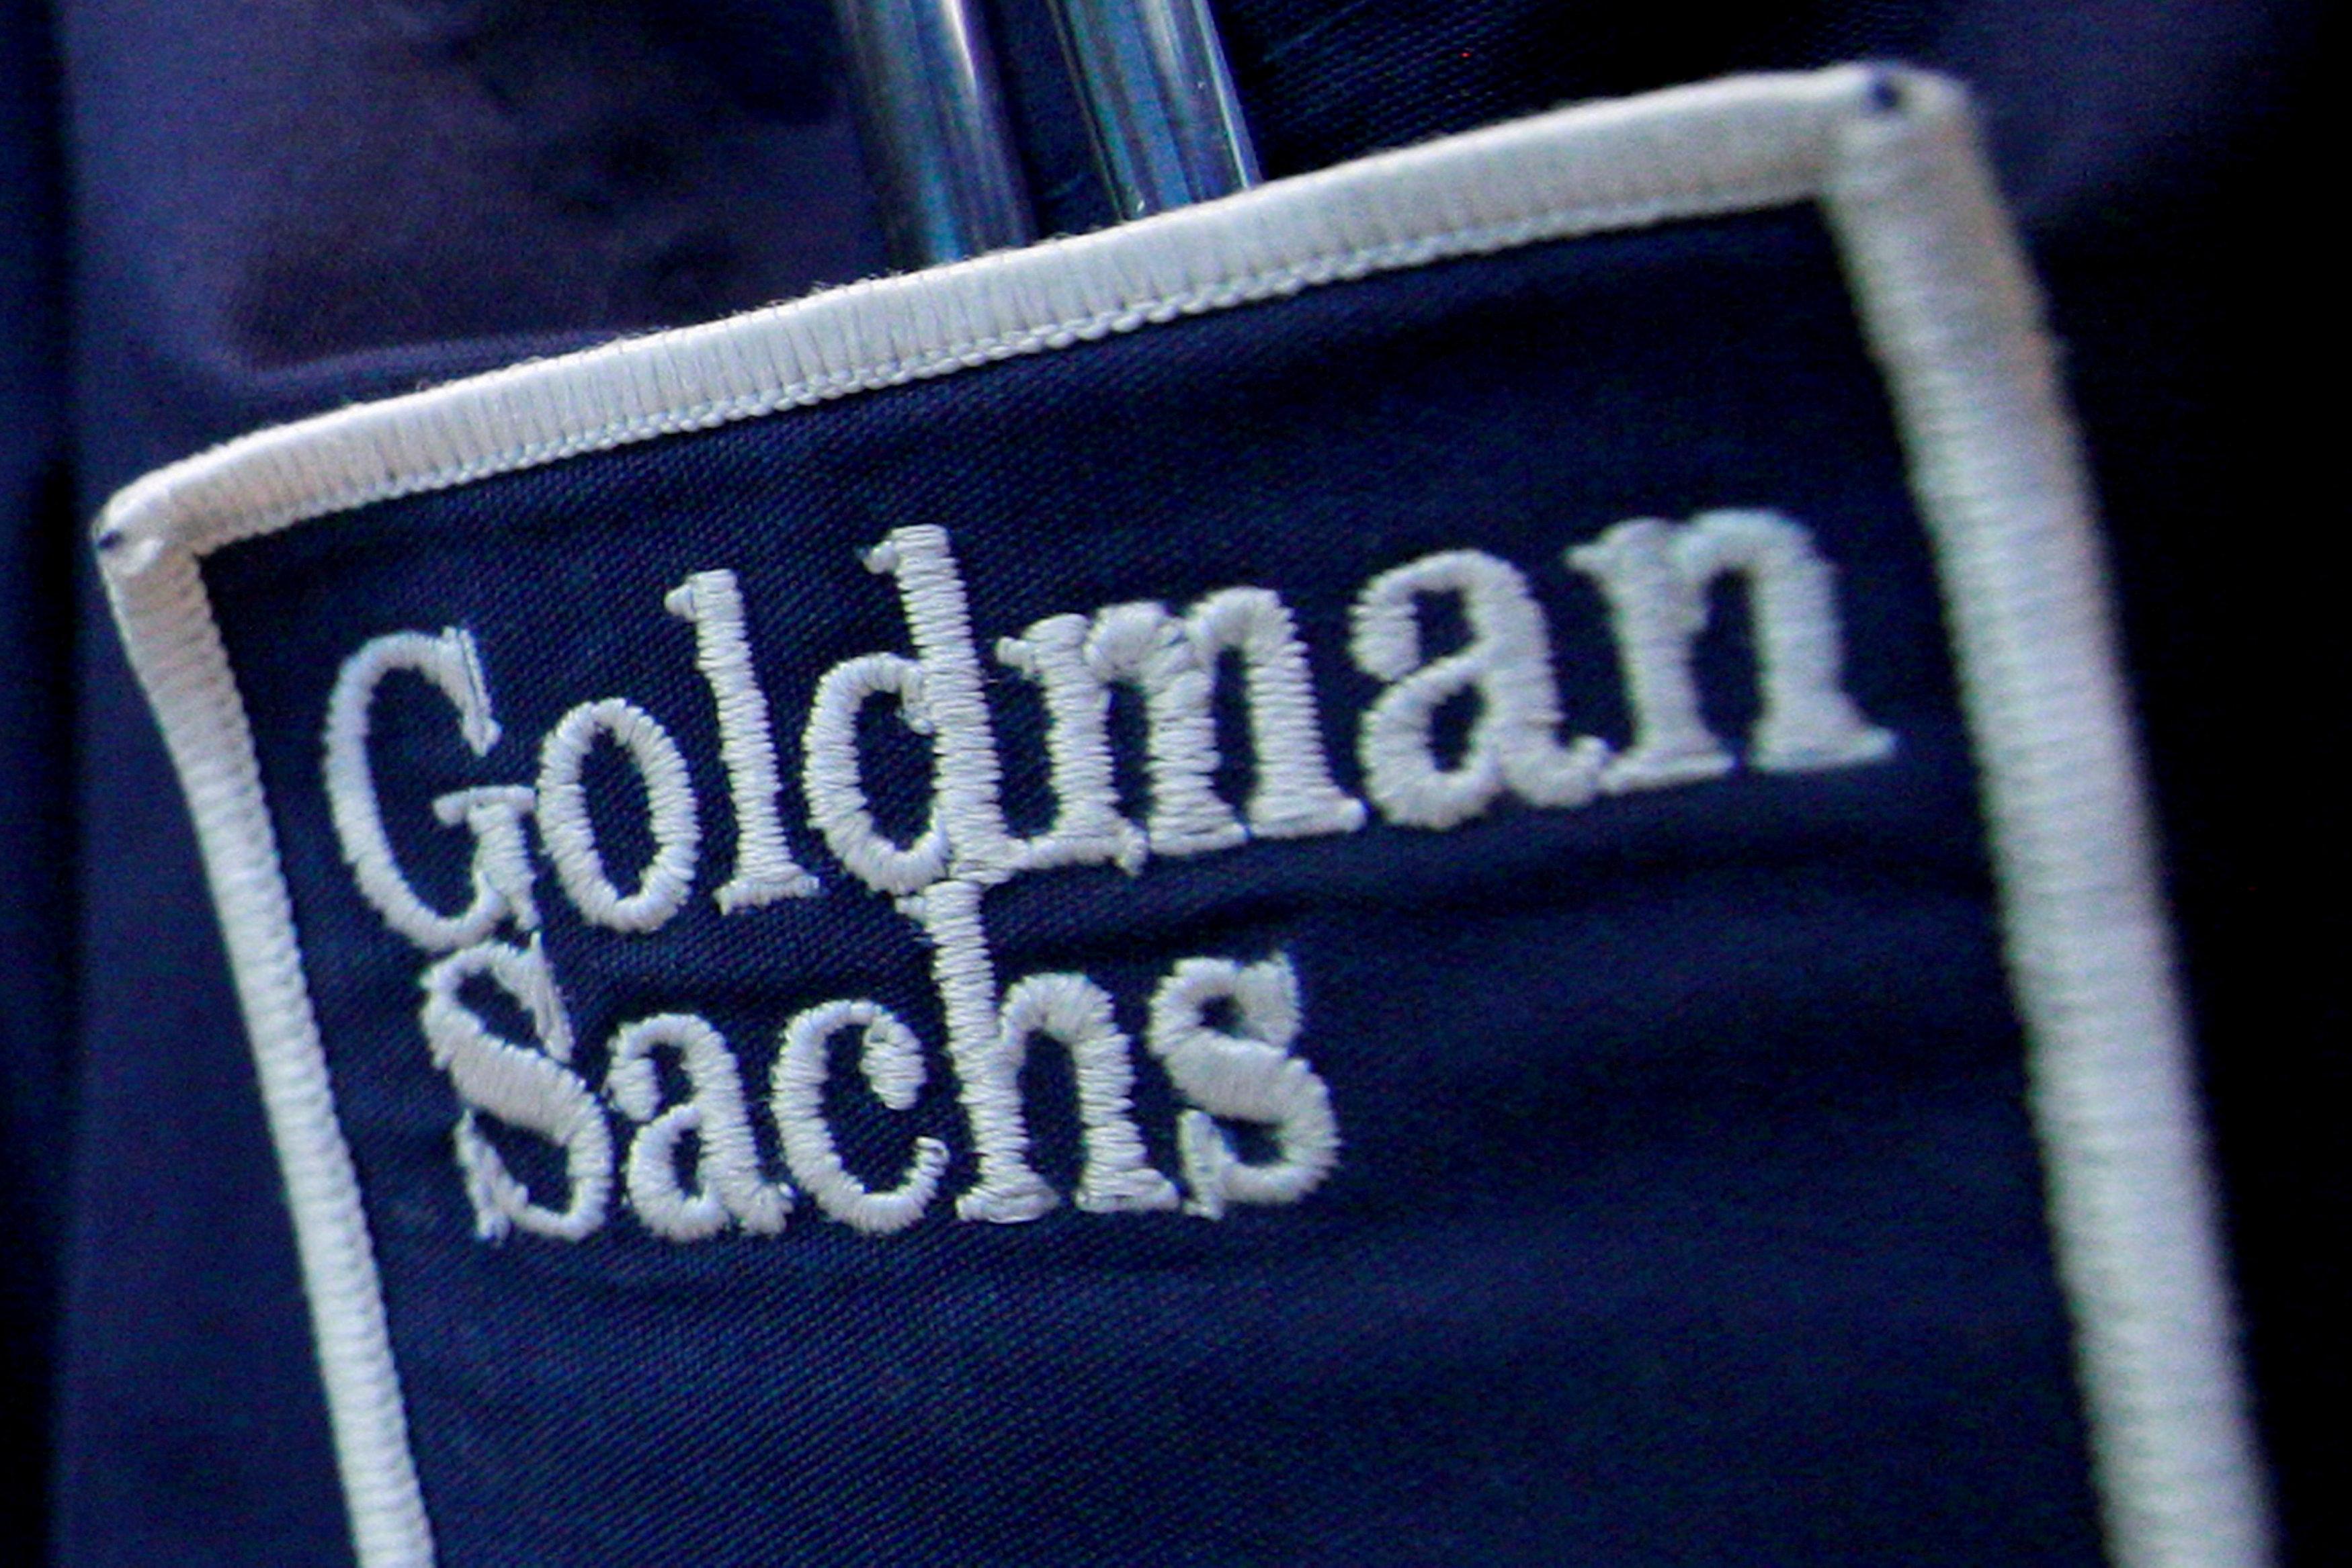 Goldman warns of $5-billion earnings hit from US tax law